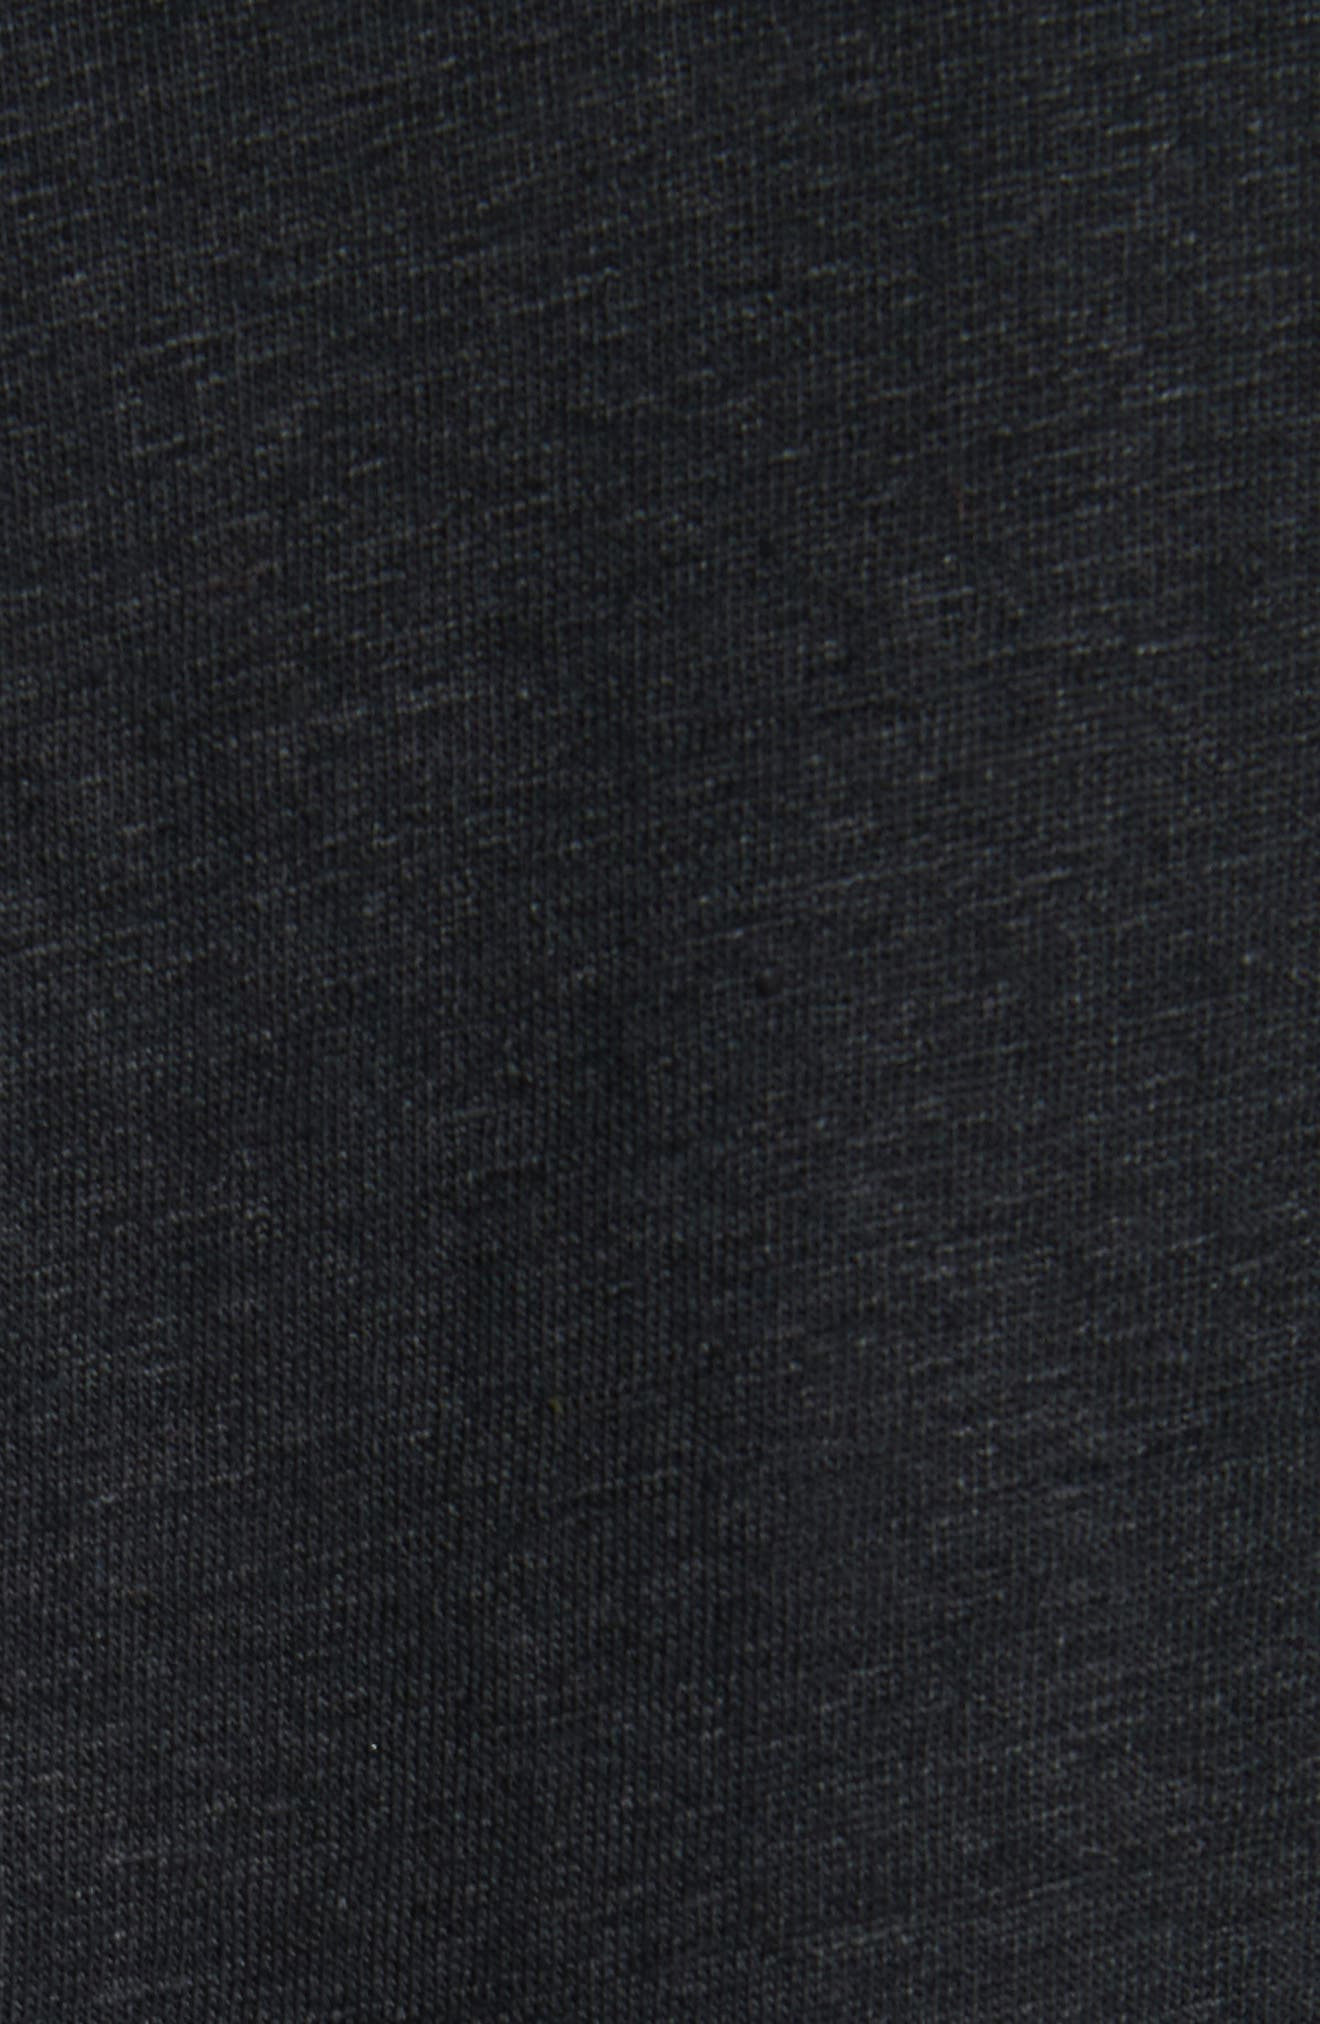 Stretch Linen Blazer,                             Alternate thumbnail 6, color,                             001